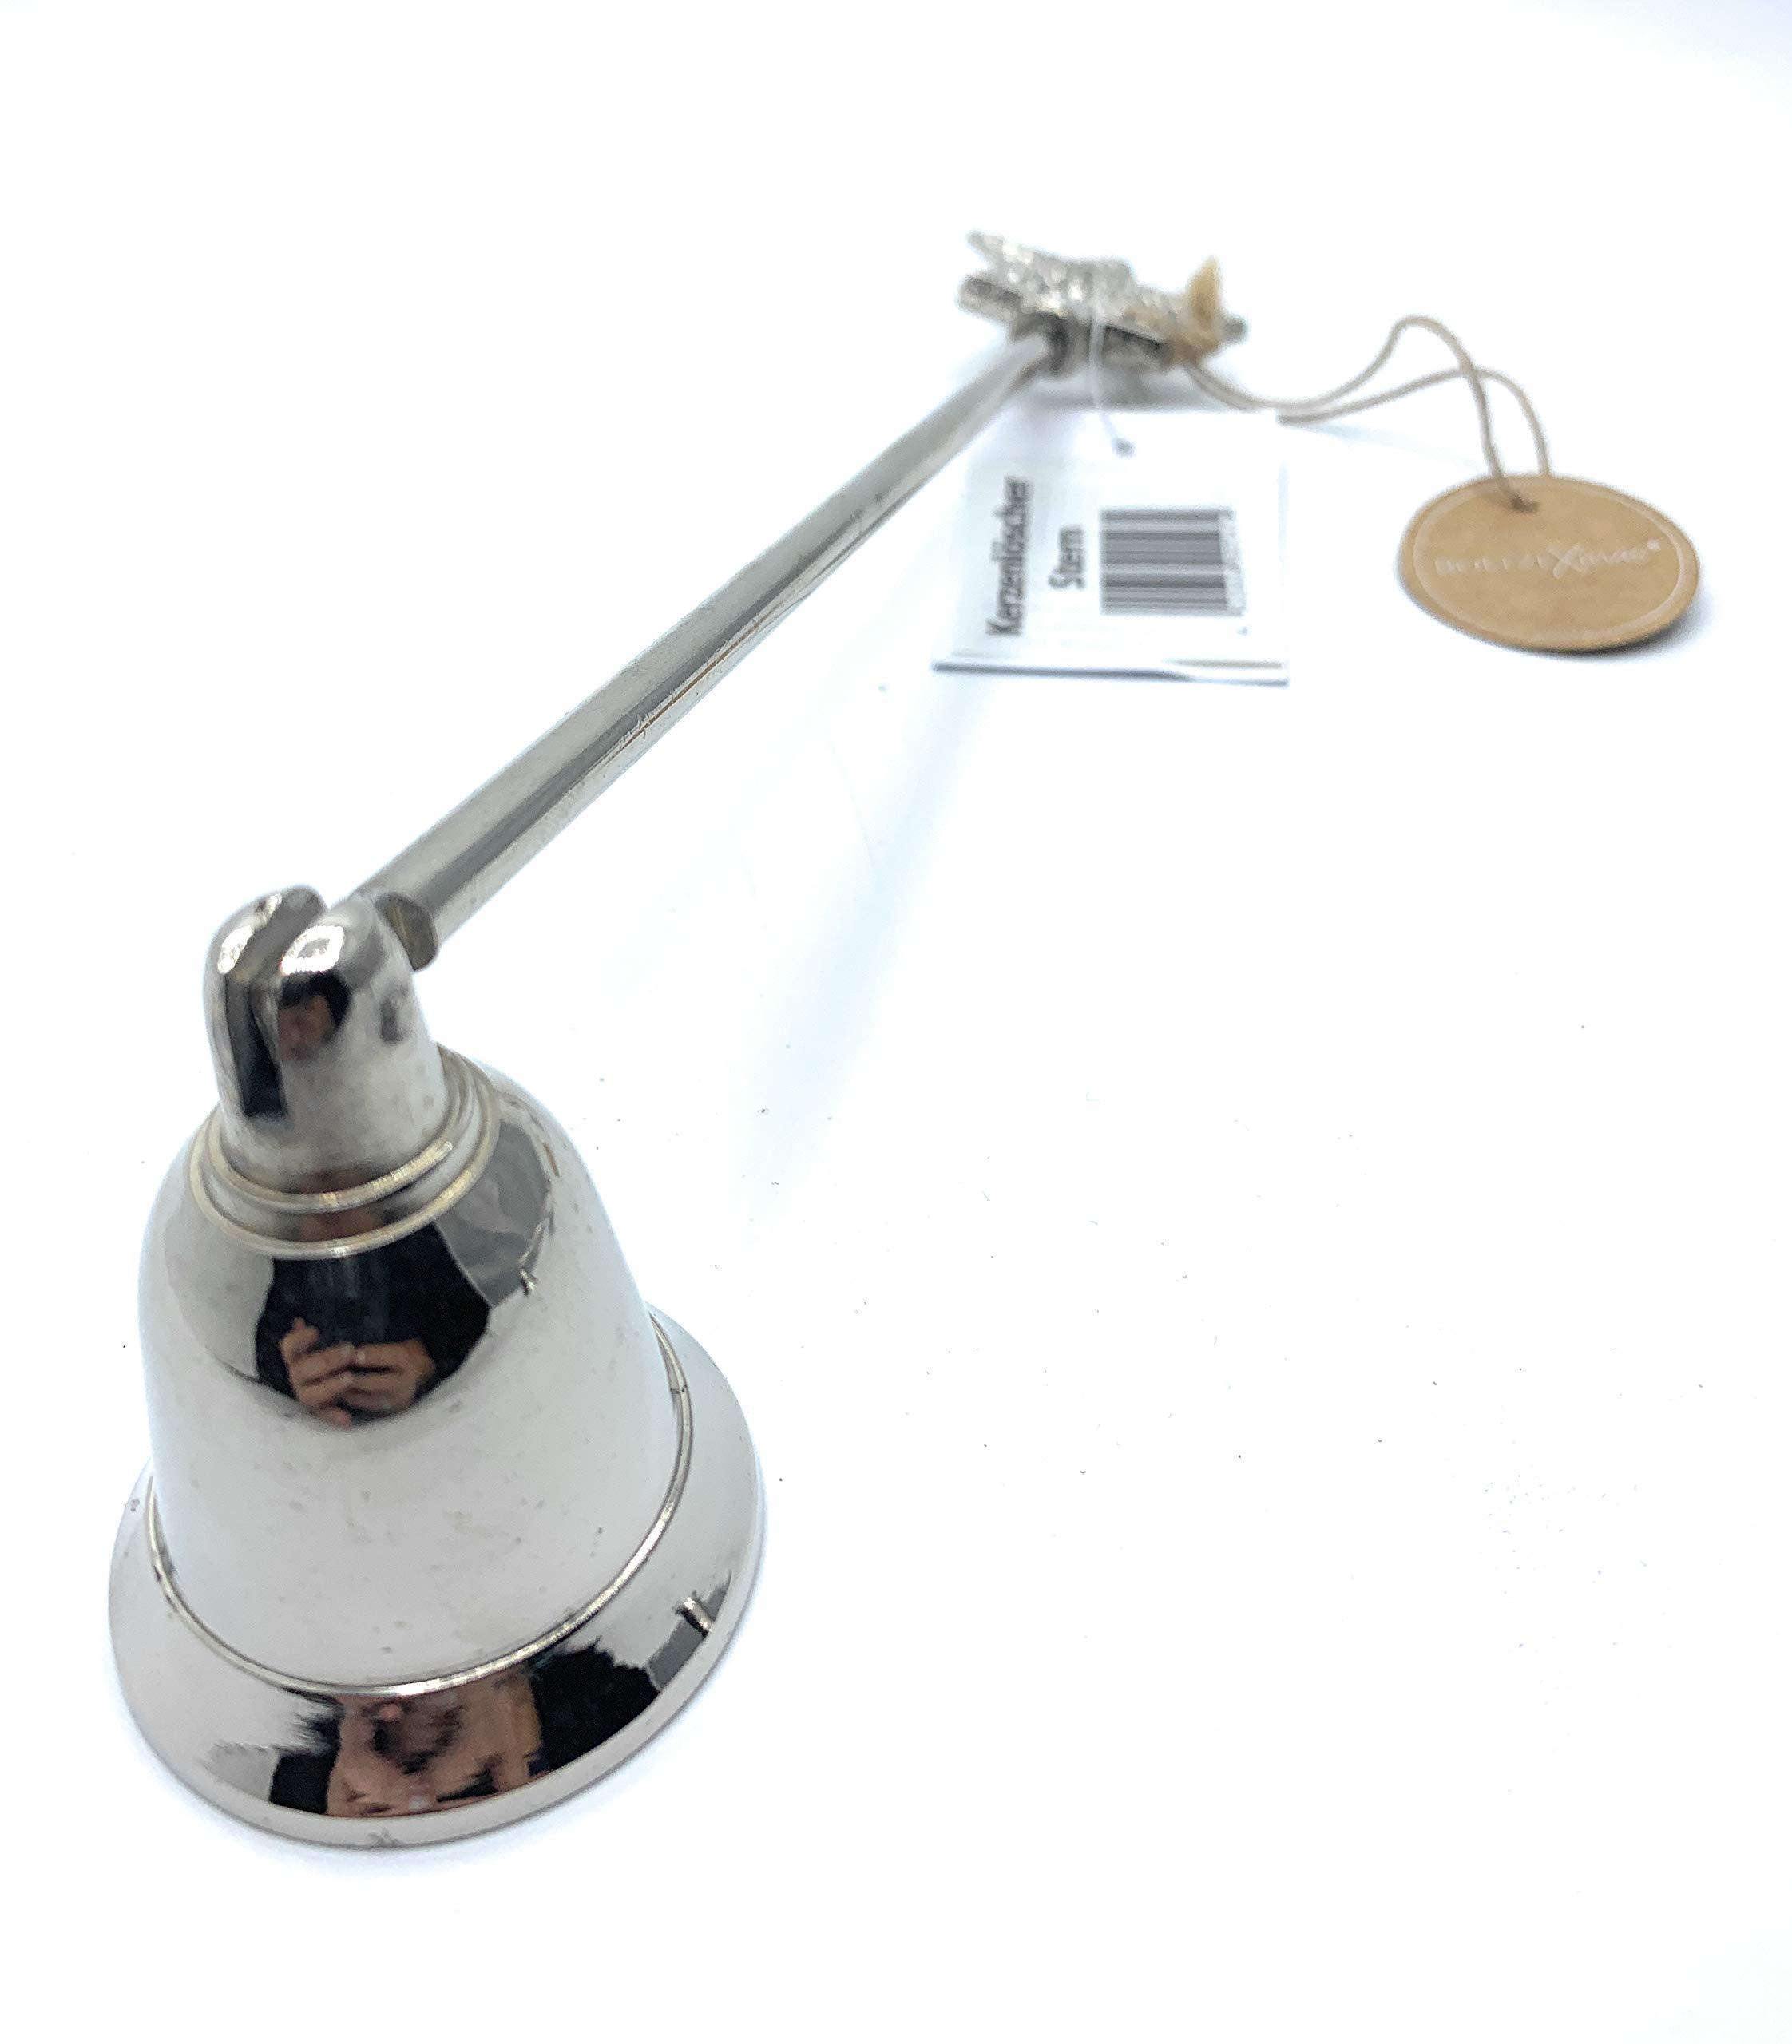 BOLTZE 1461700Candle Extinguisher Elis Alu 29cm Gold